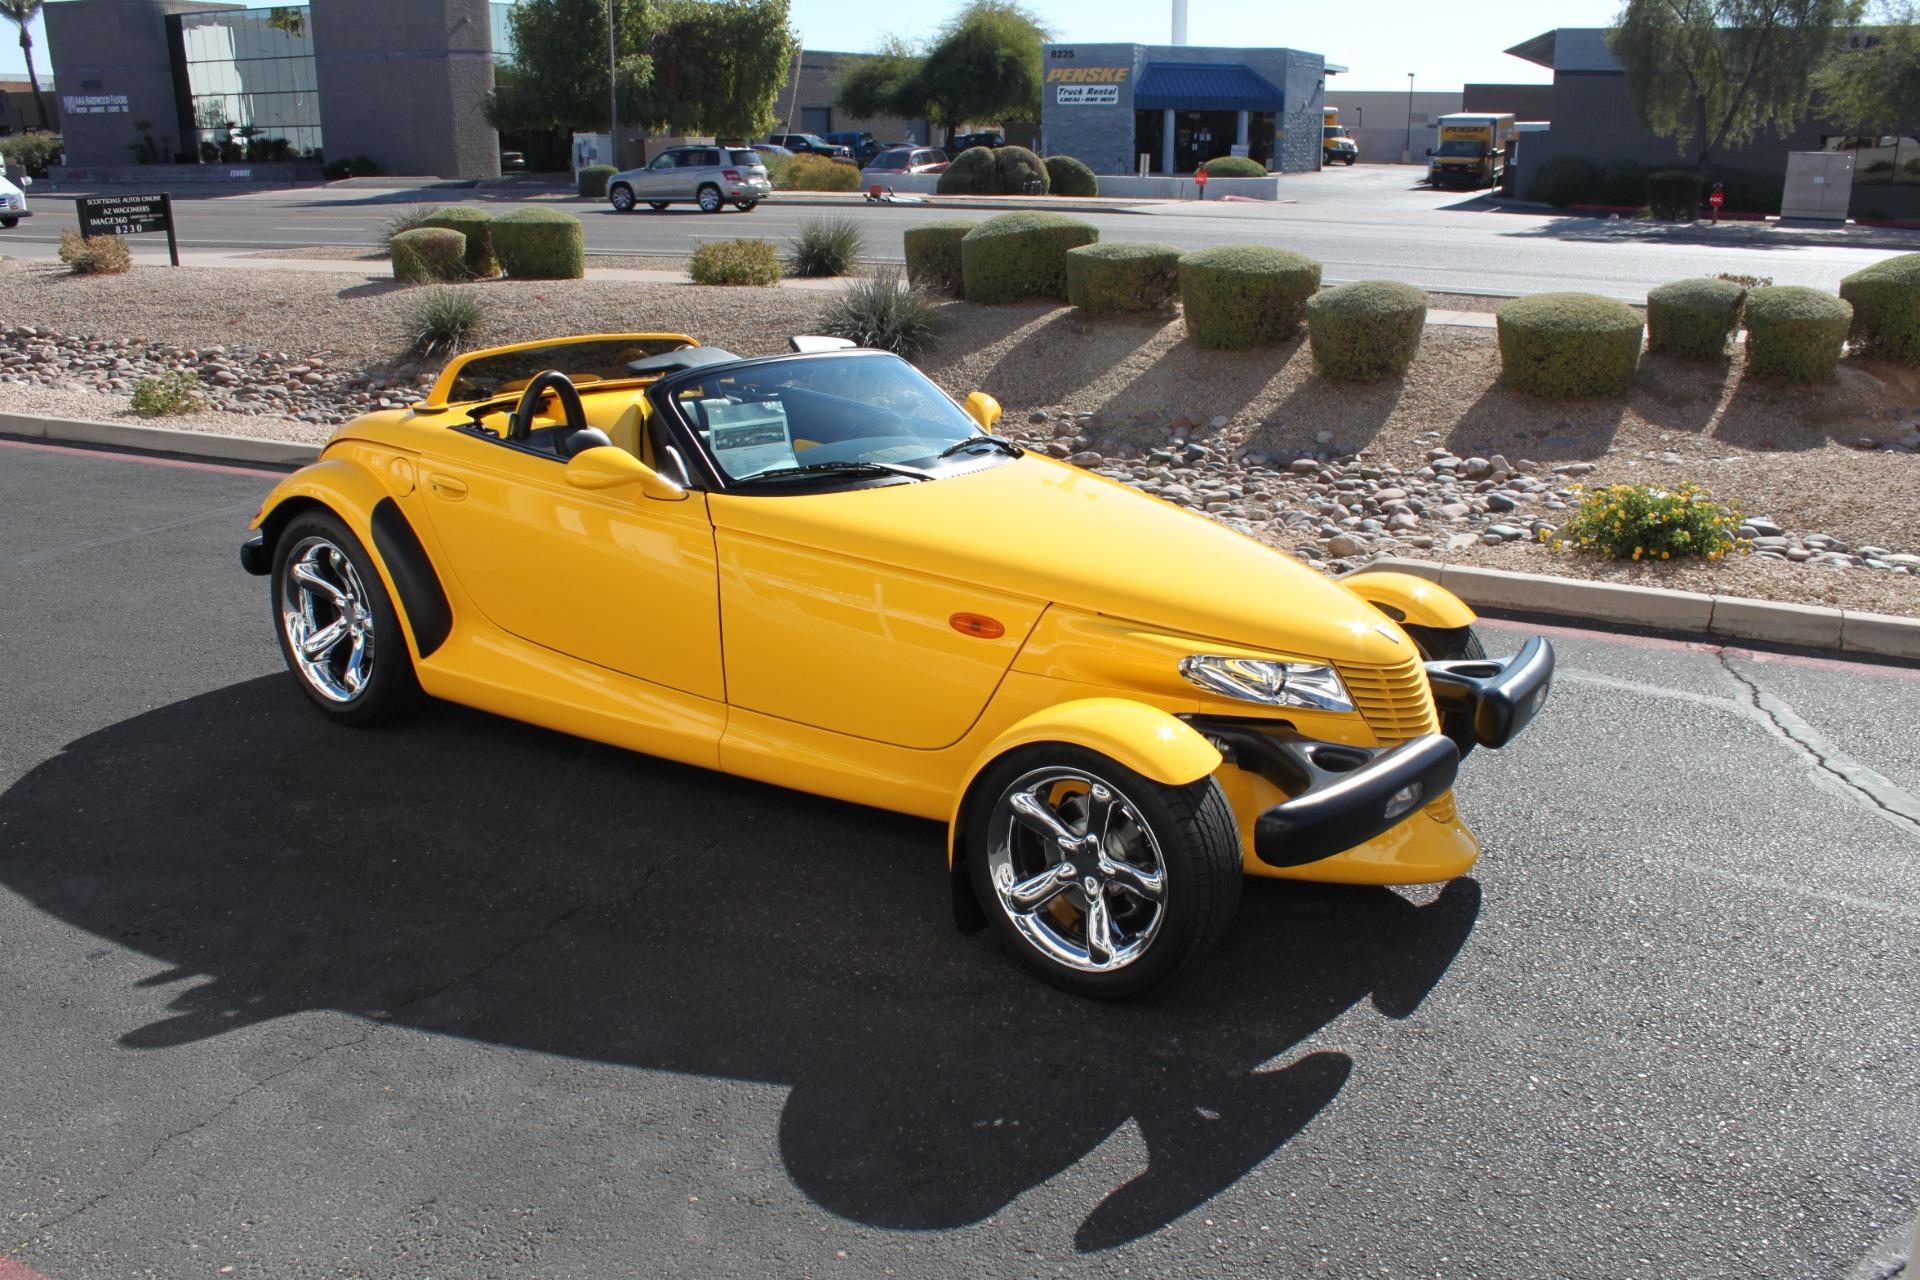 Used-2002-Chrysler-Prowler-Fiat